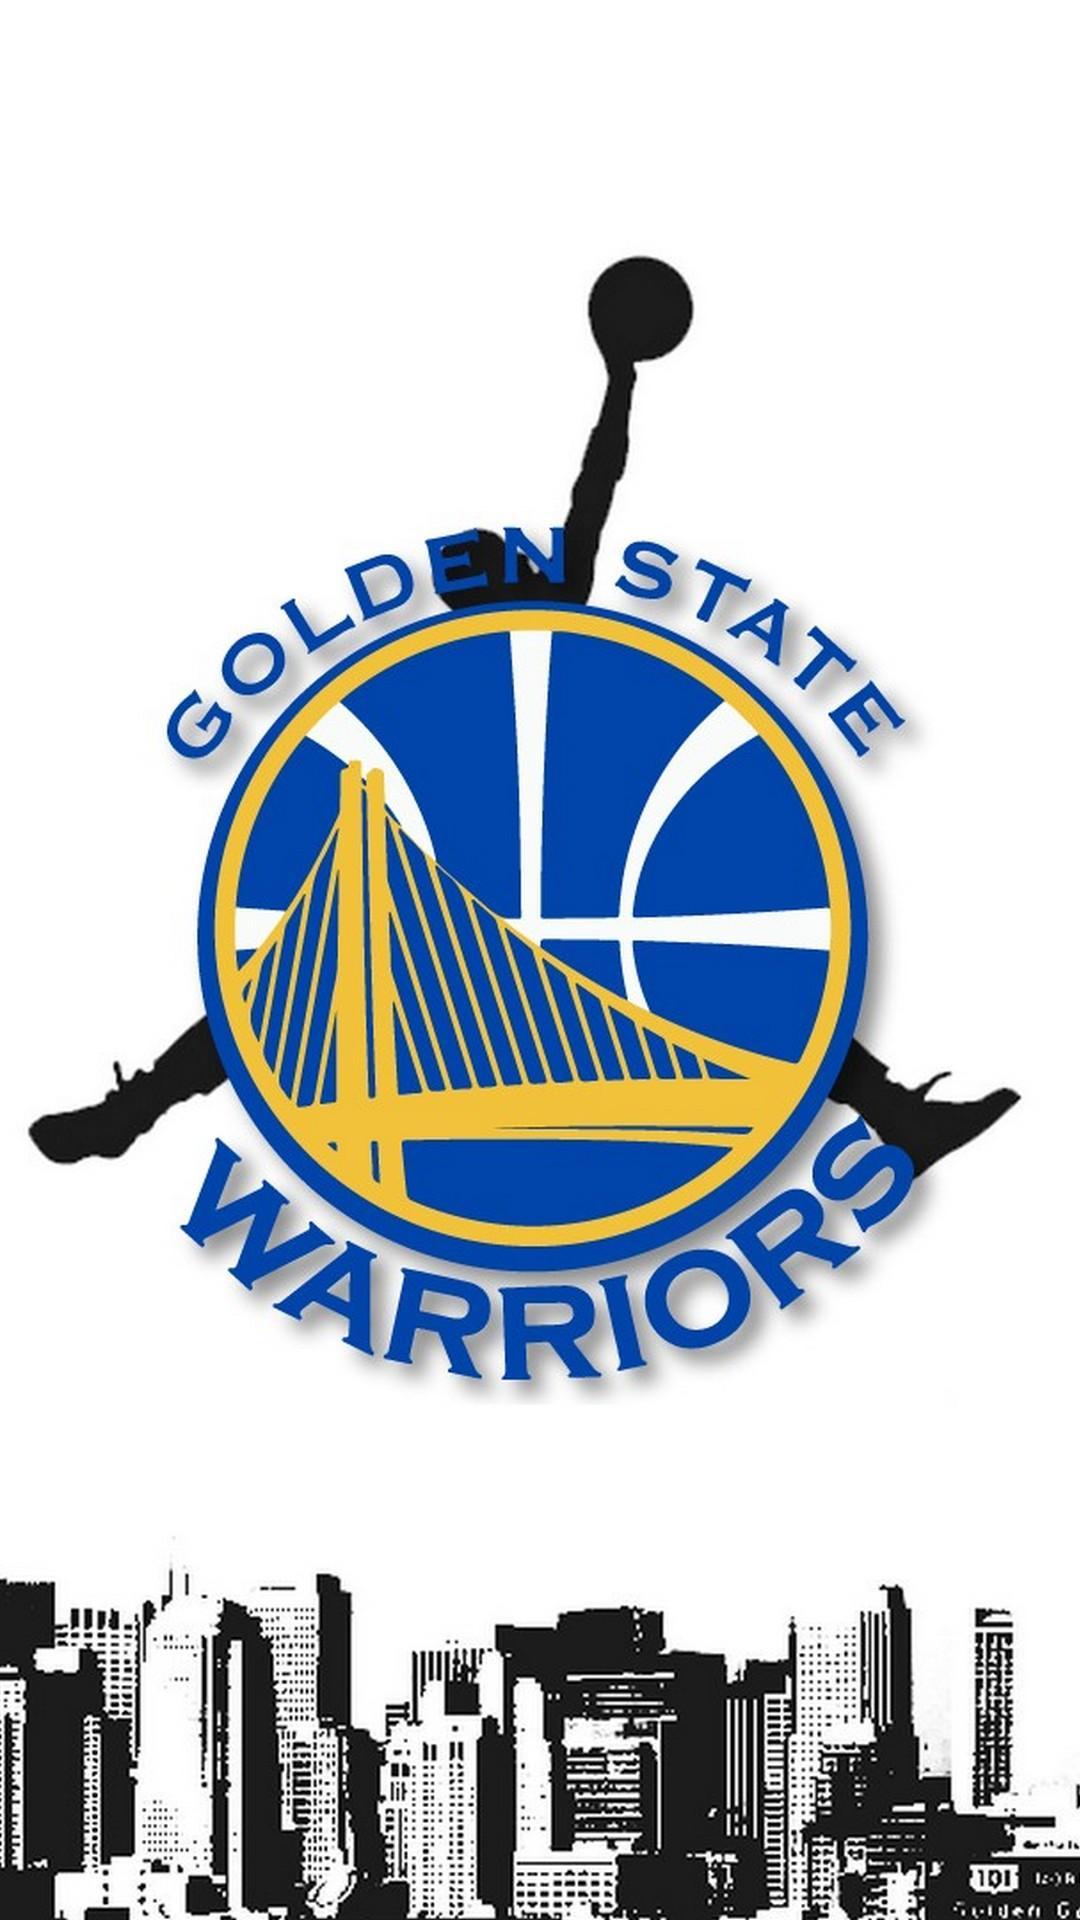 Golden State Warriors 2019 Wallpapers - Wallpaper Cave